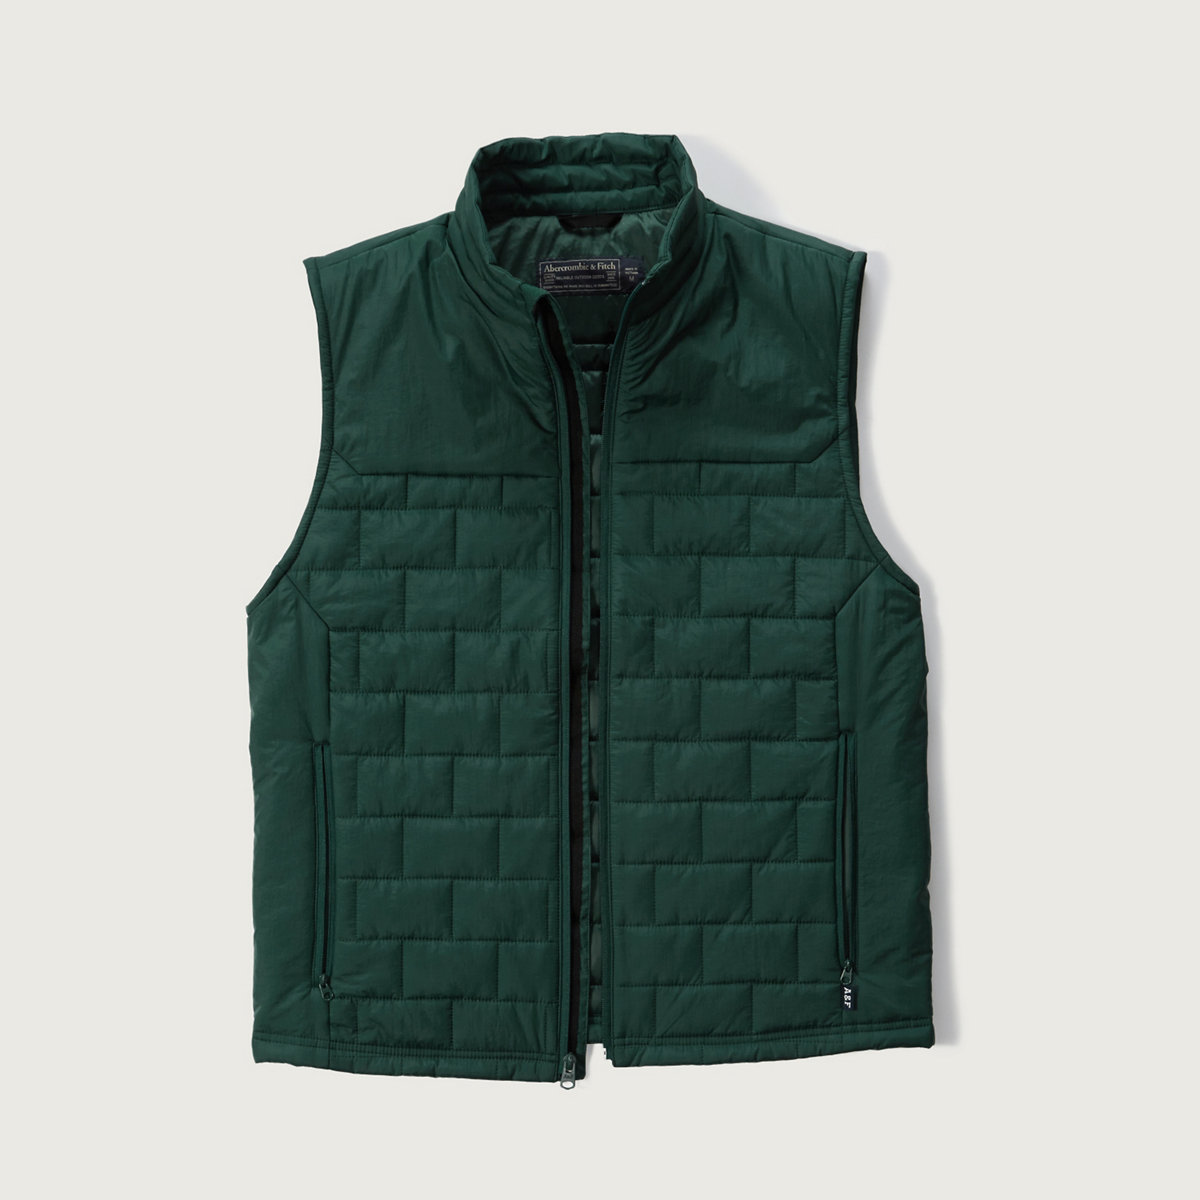 Primaloft Lightweight Puffer Vest